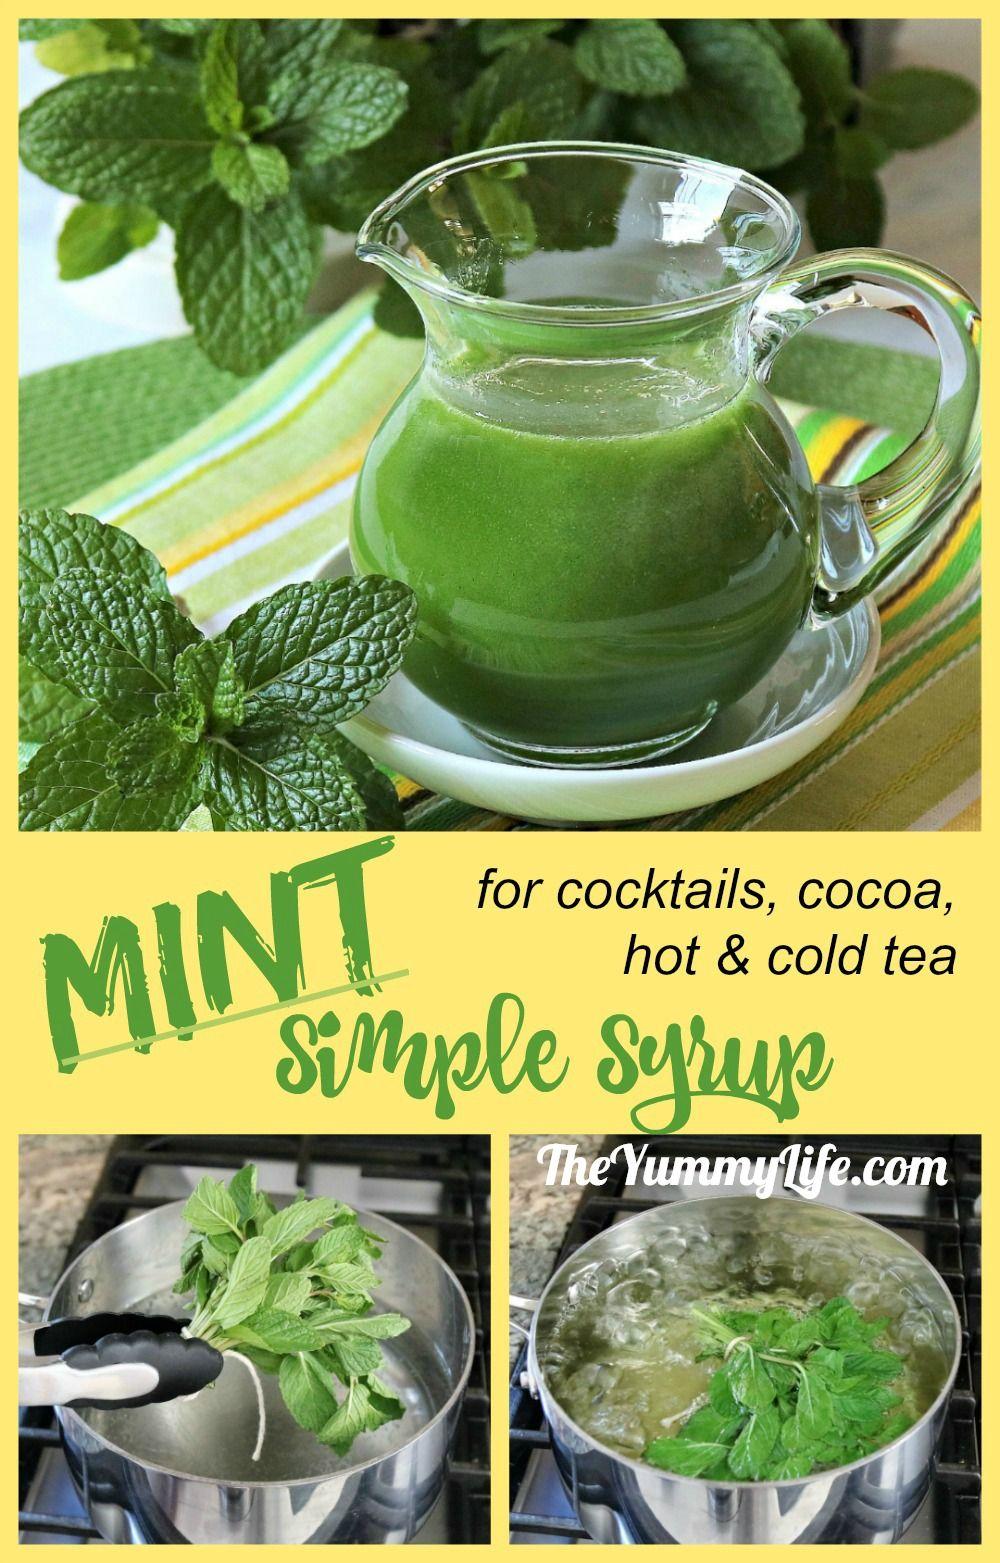 Instant Ocean Ingredients : Mint simple syrup only ingredients